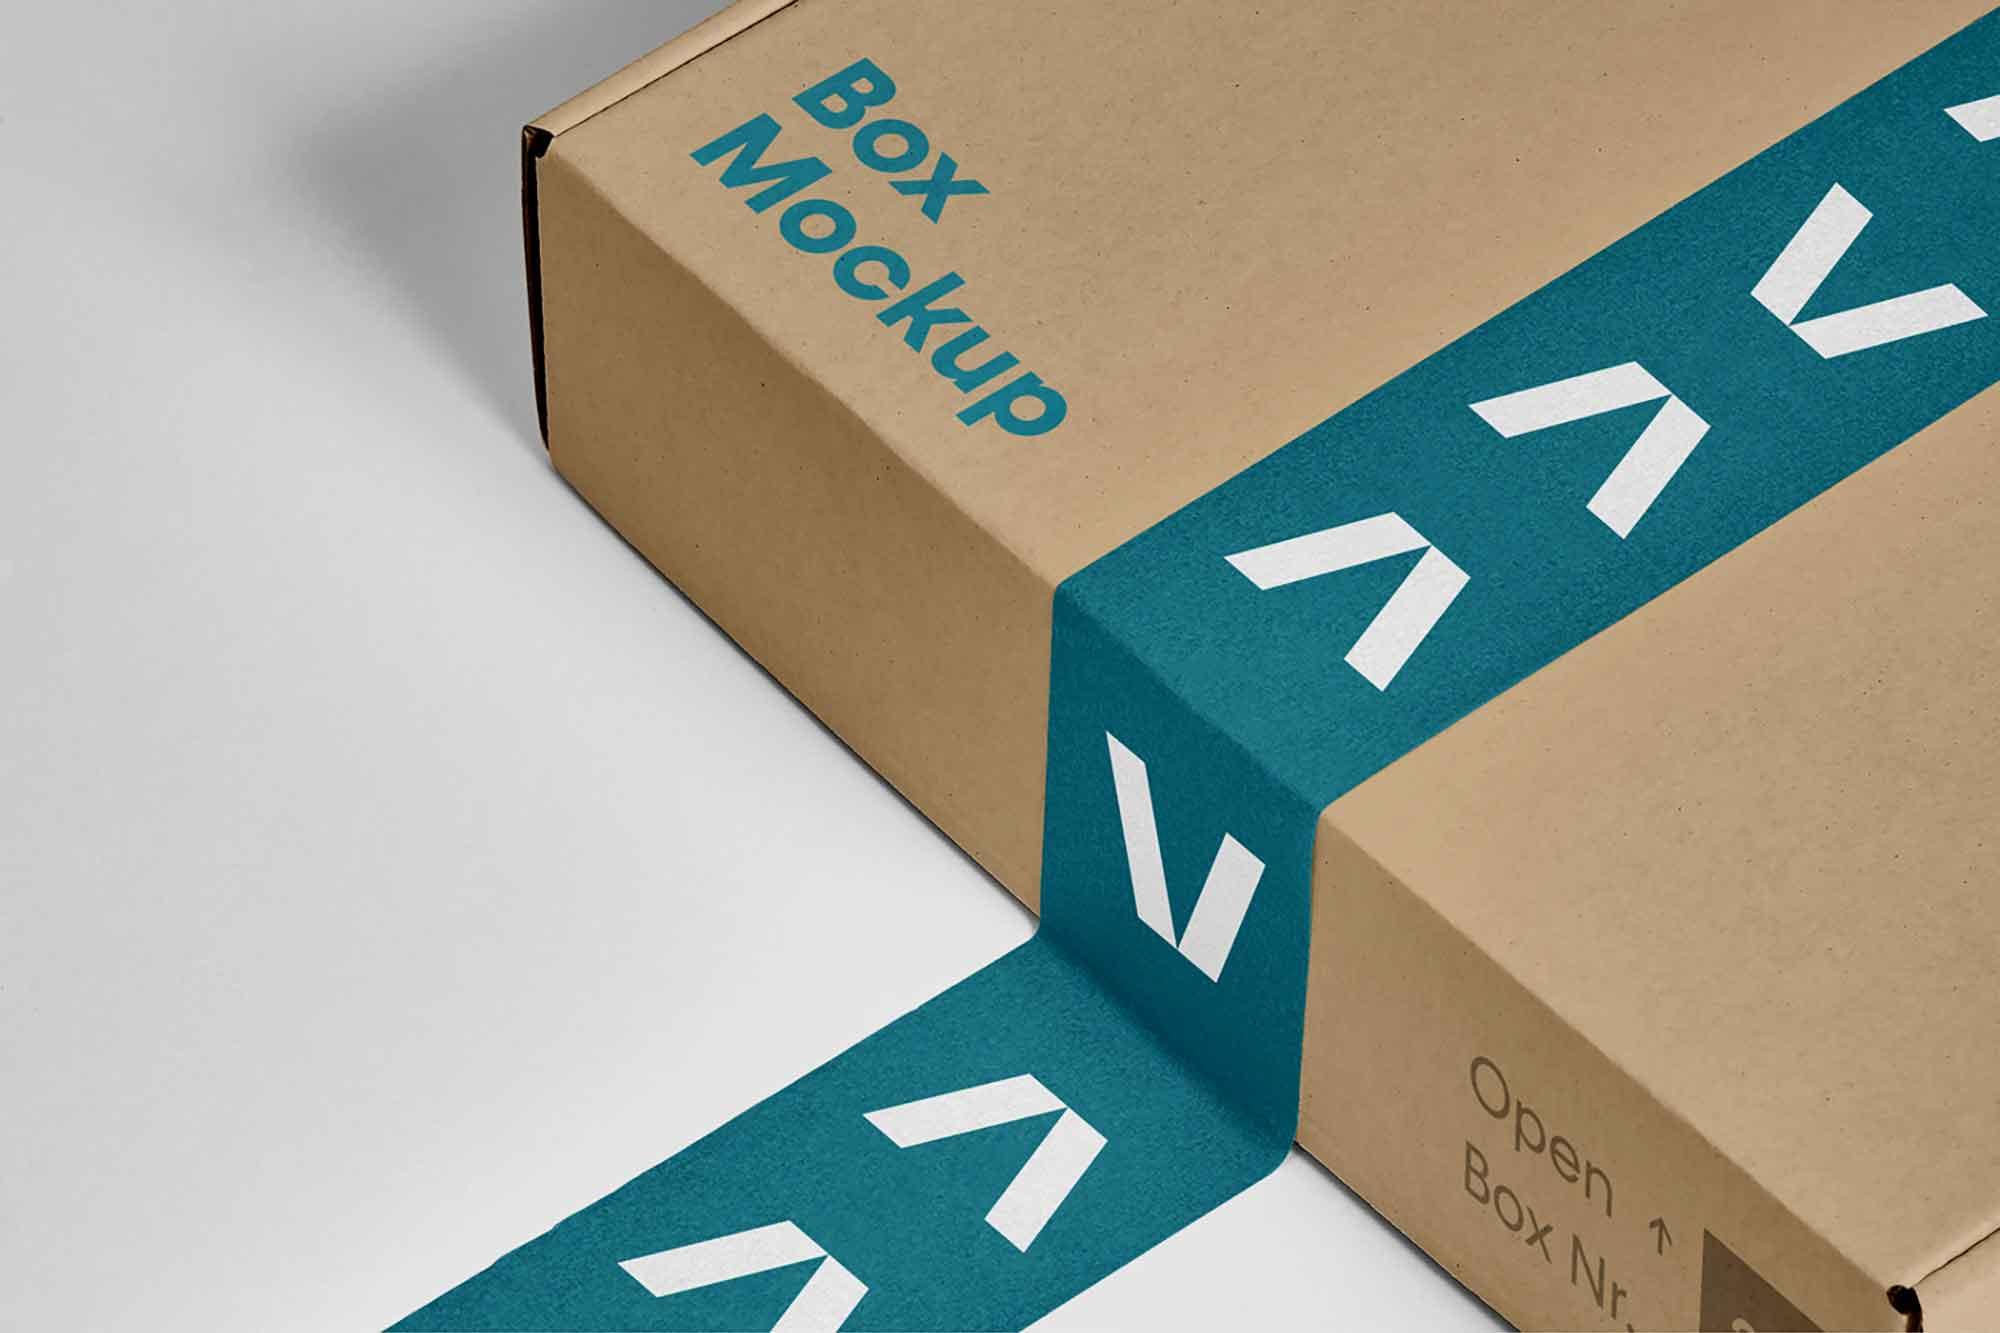 Free Box with Tape Mockup